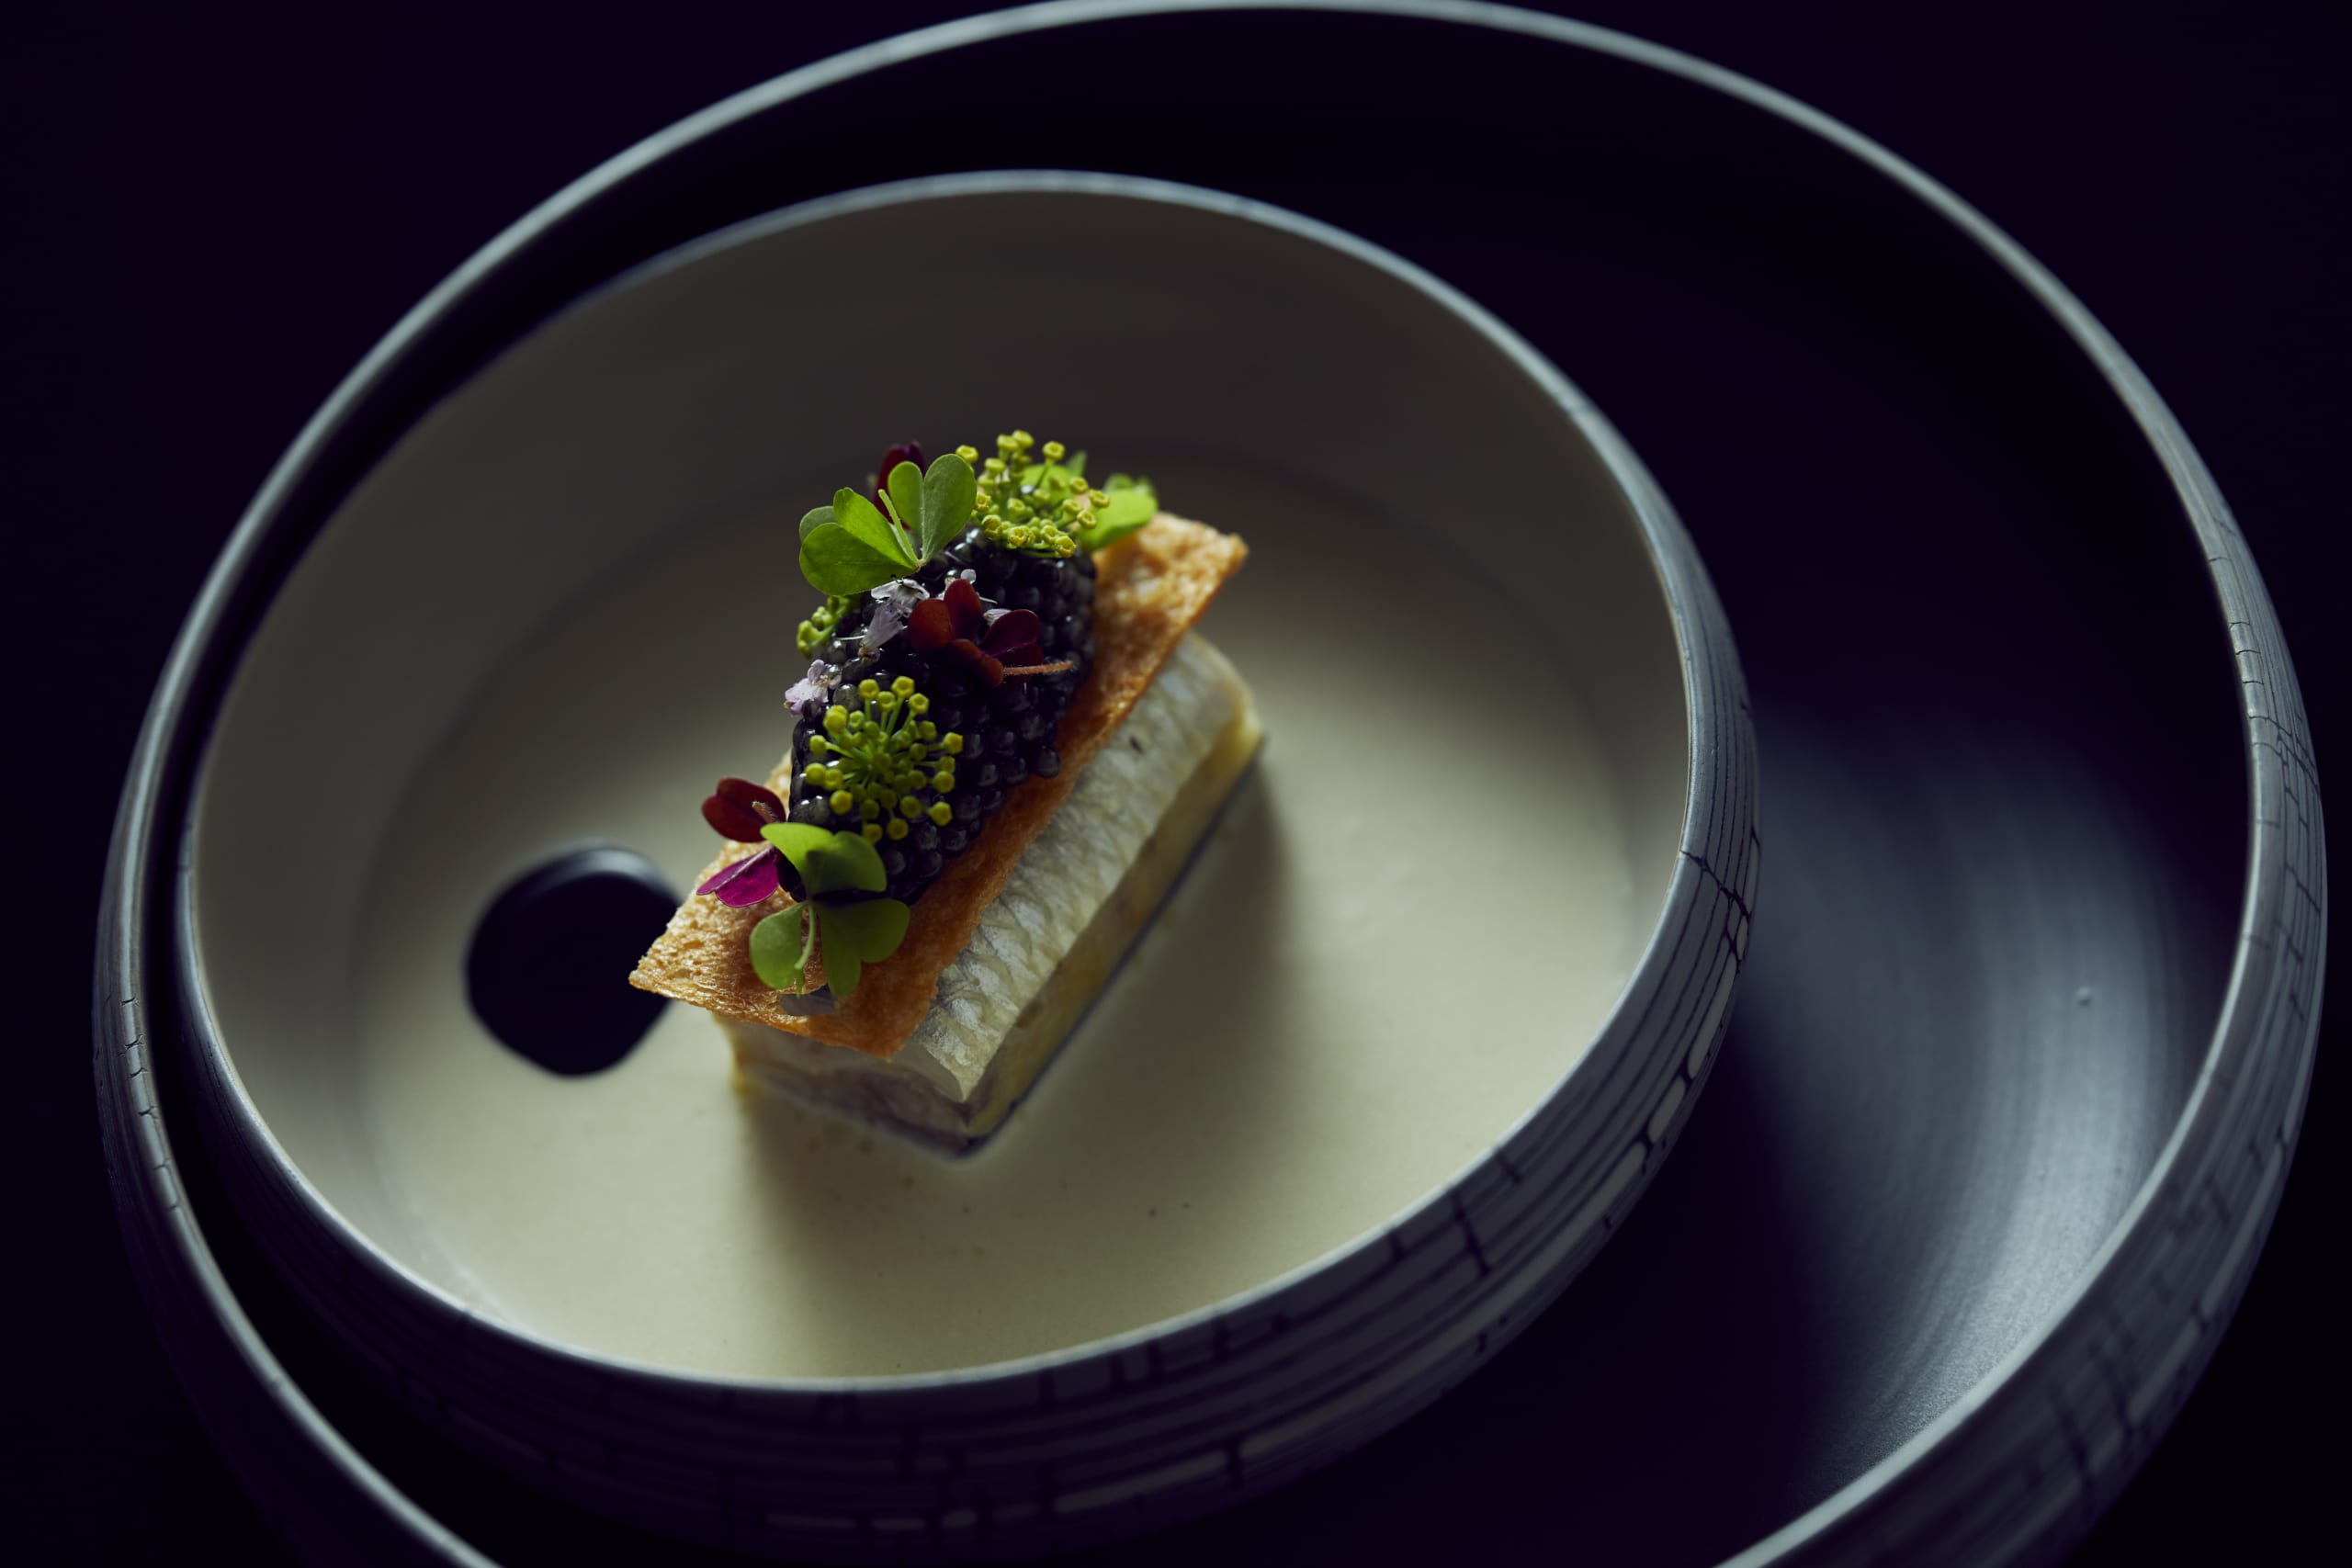 200716 HOMMAGE 0174s1 scaled 2 Star Michelin Chef Noboru Arai   Restaurant Hommage Tokyo meets Rochini